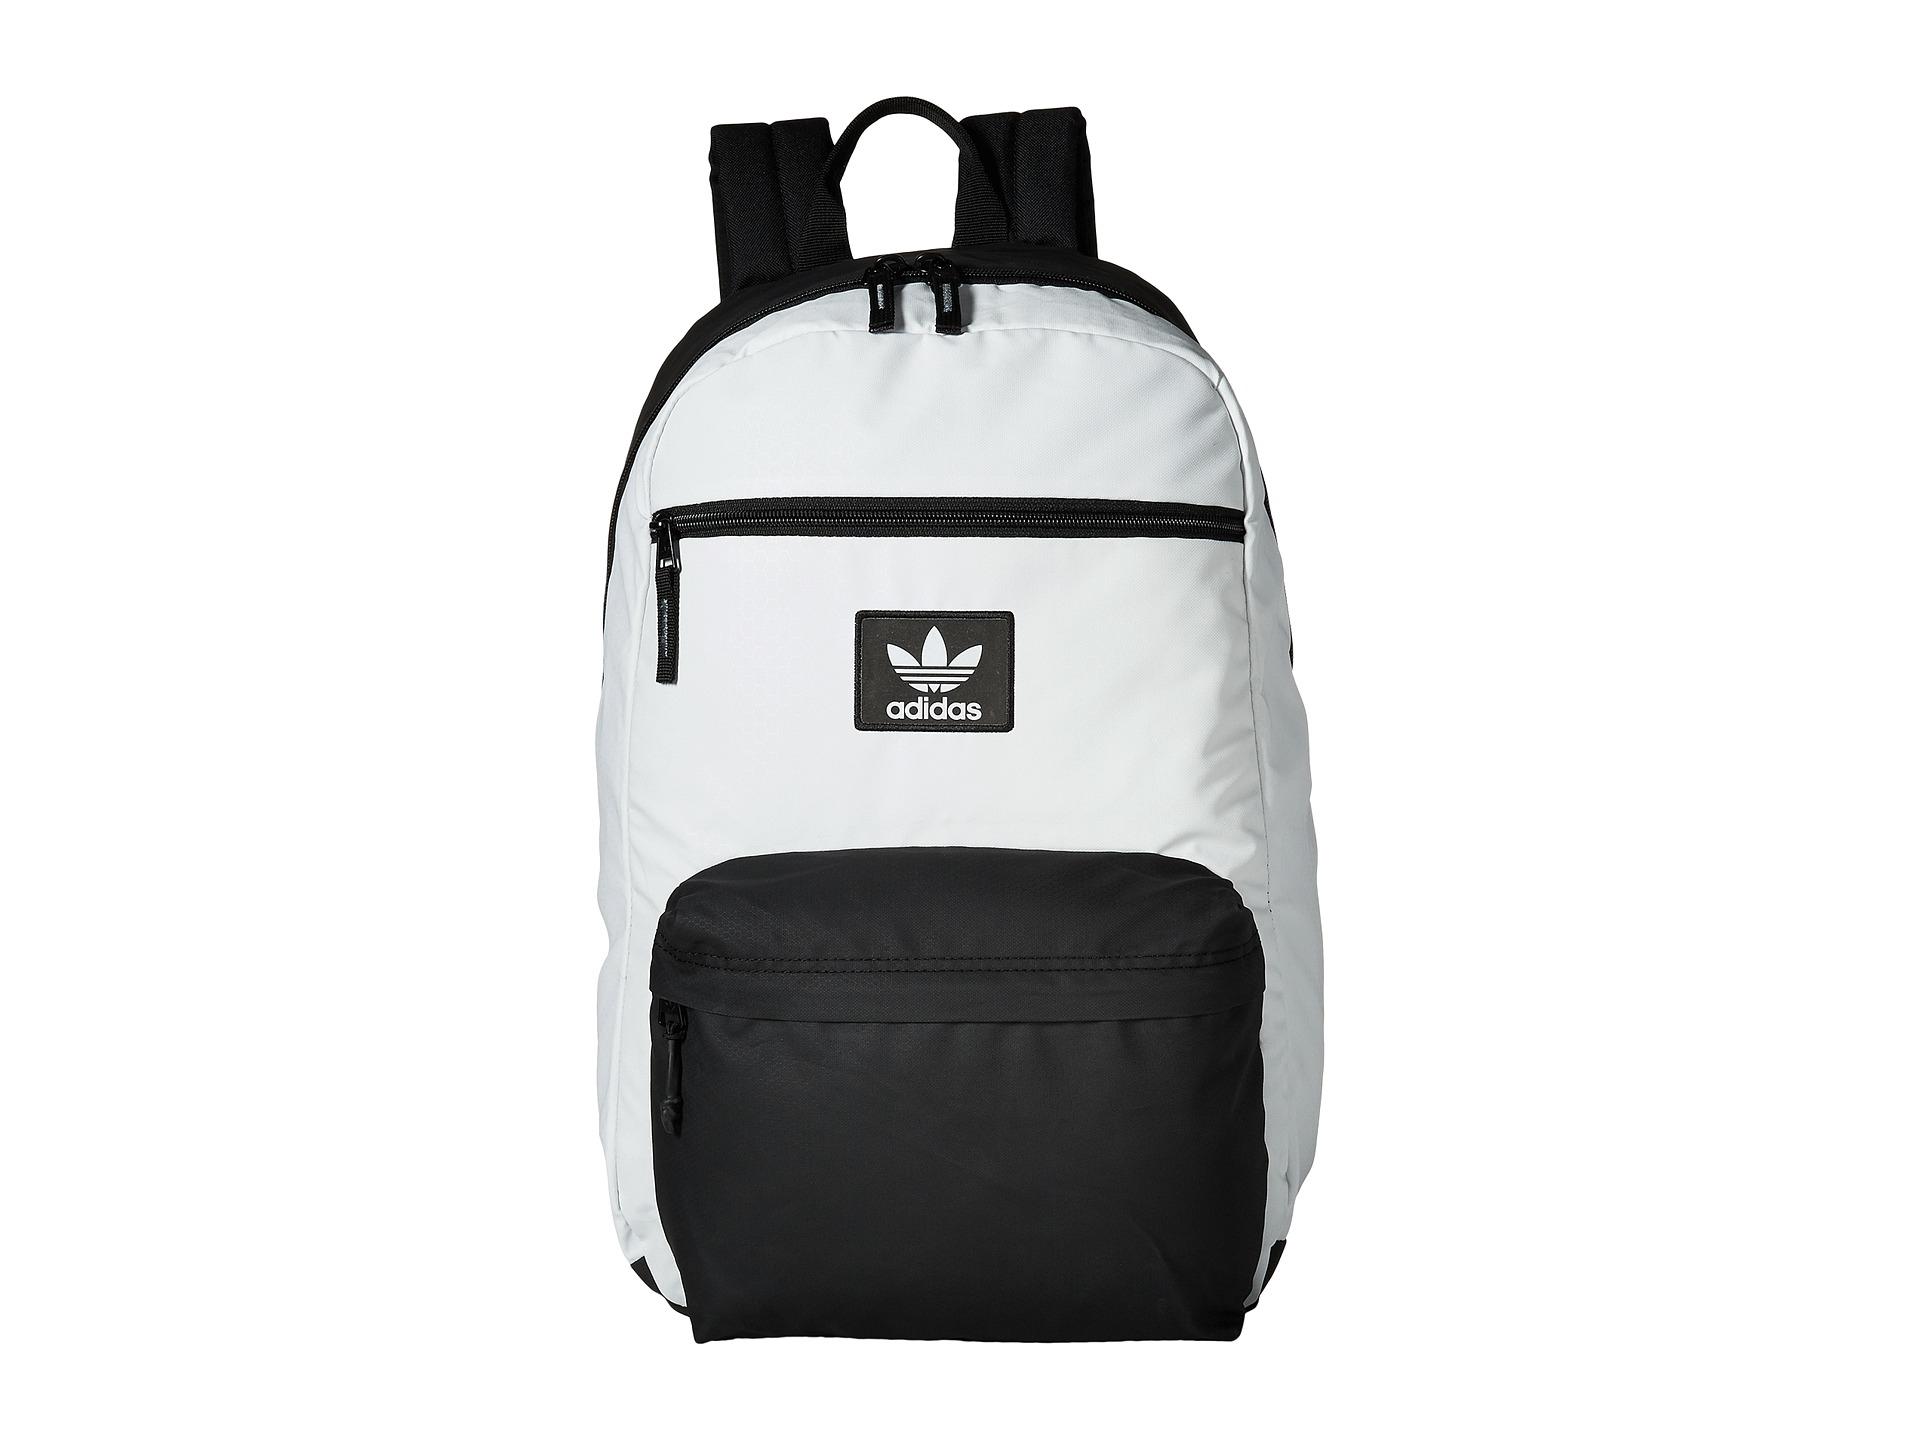 a57340bffb Lyst - adidas Originals Originals National Plus Backpack in Black ...